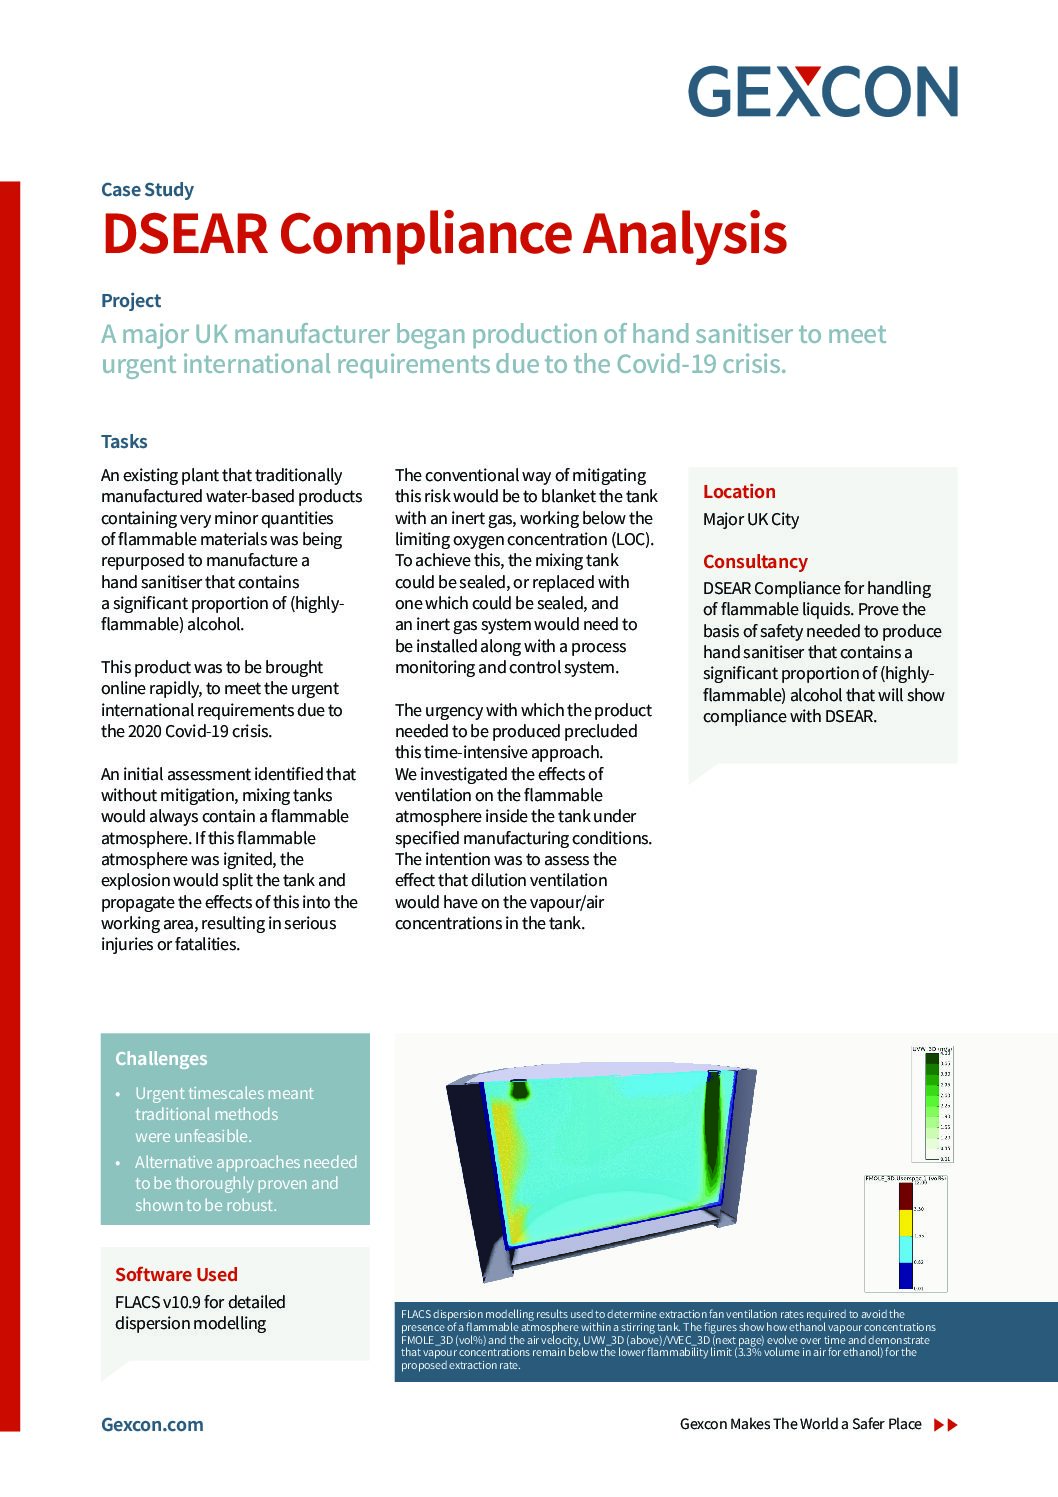 DSEAR Compliance Analysis - Hand Sanitiser Manufacturing